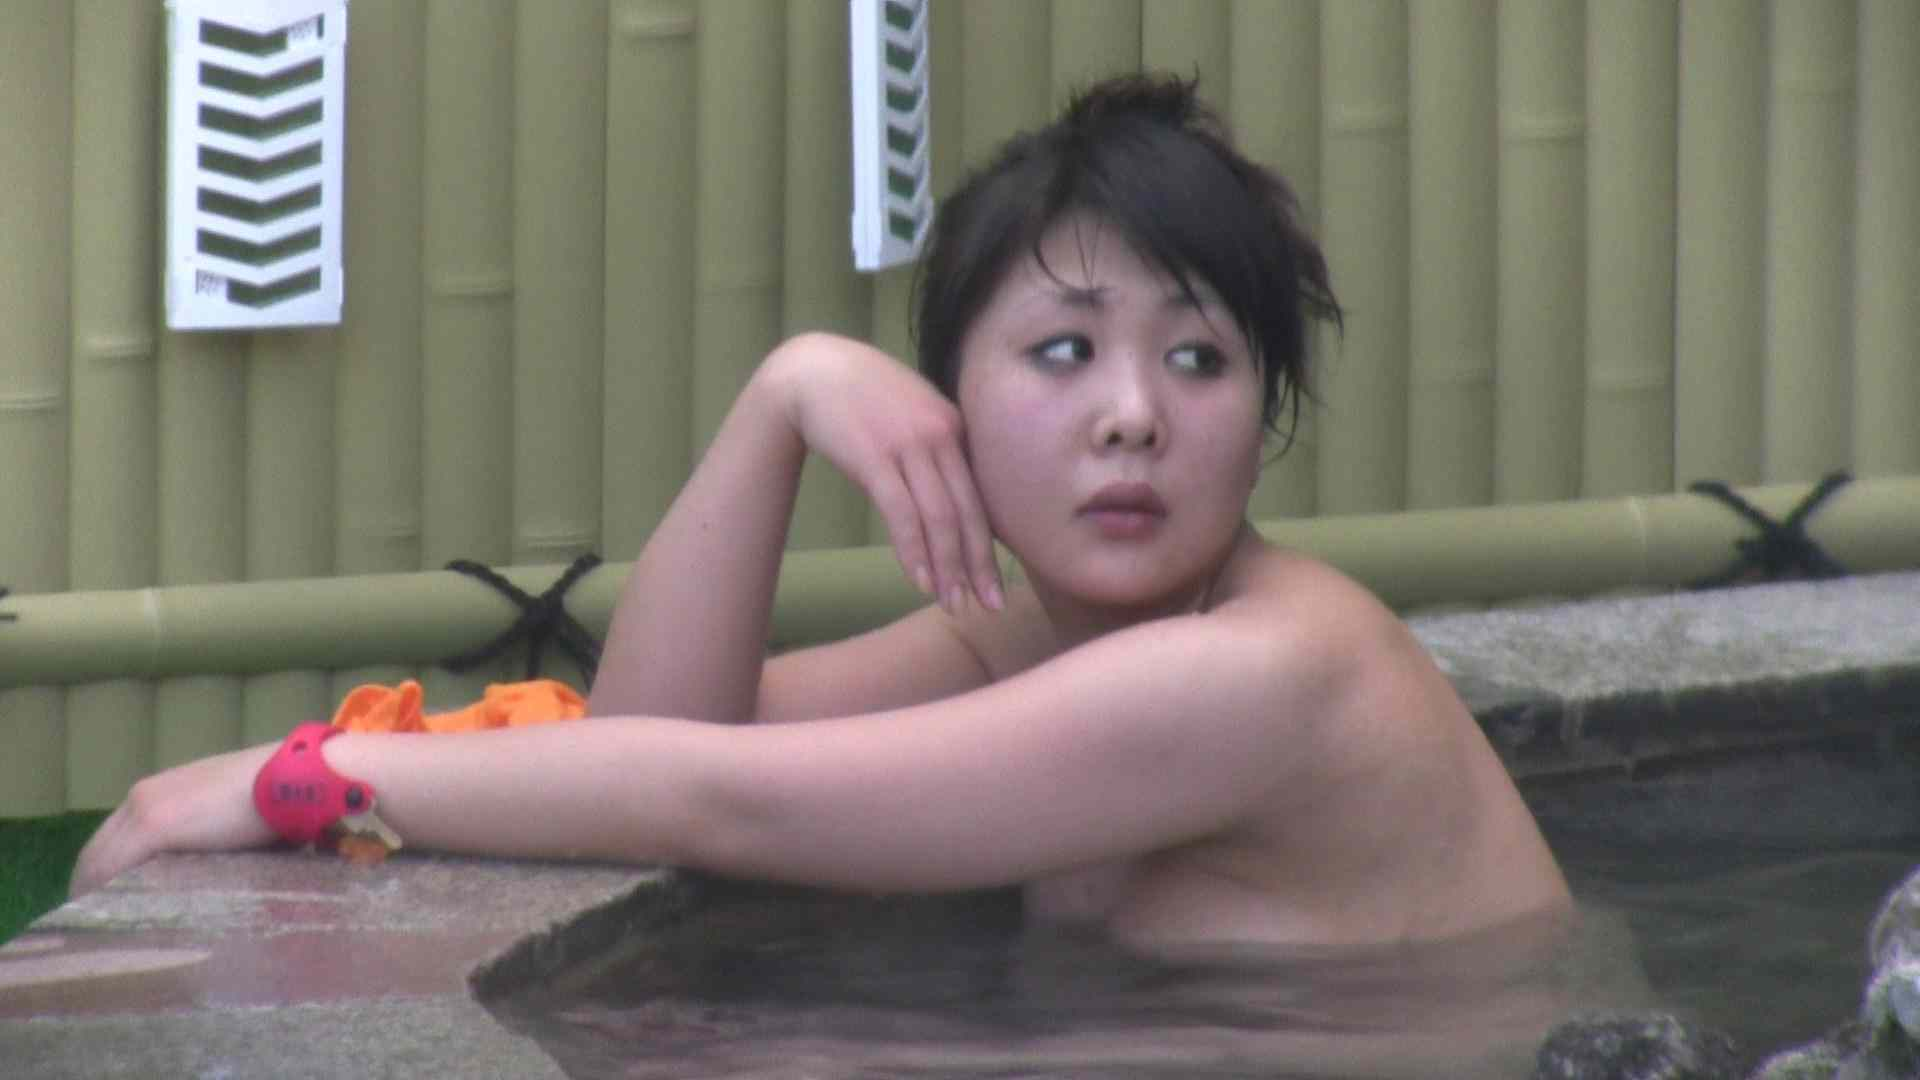 Aquaな露天風呂Vol.118 OL女体  68連発 66